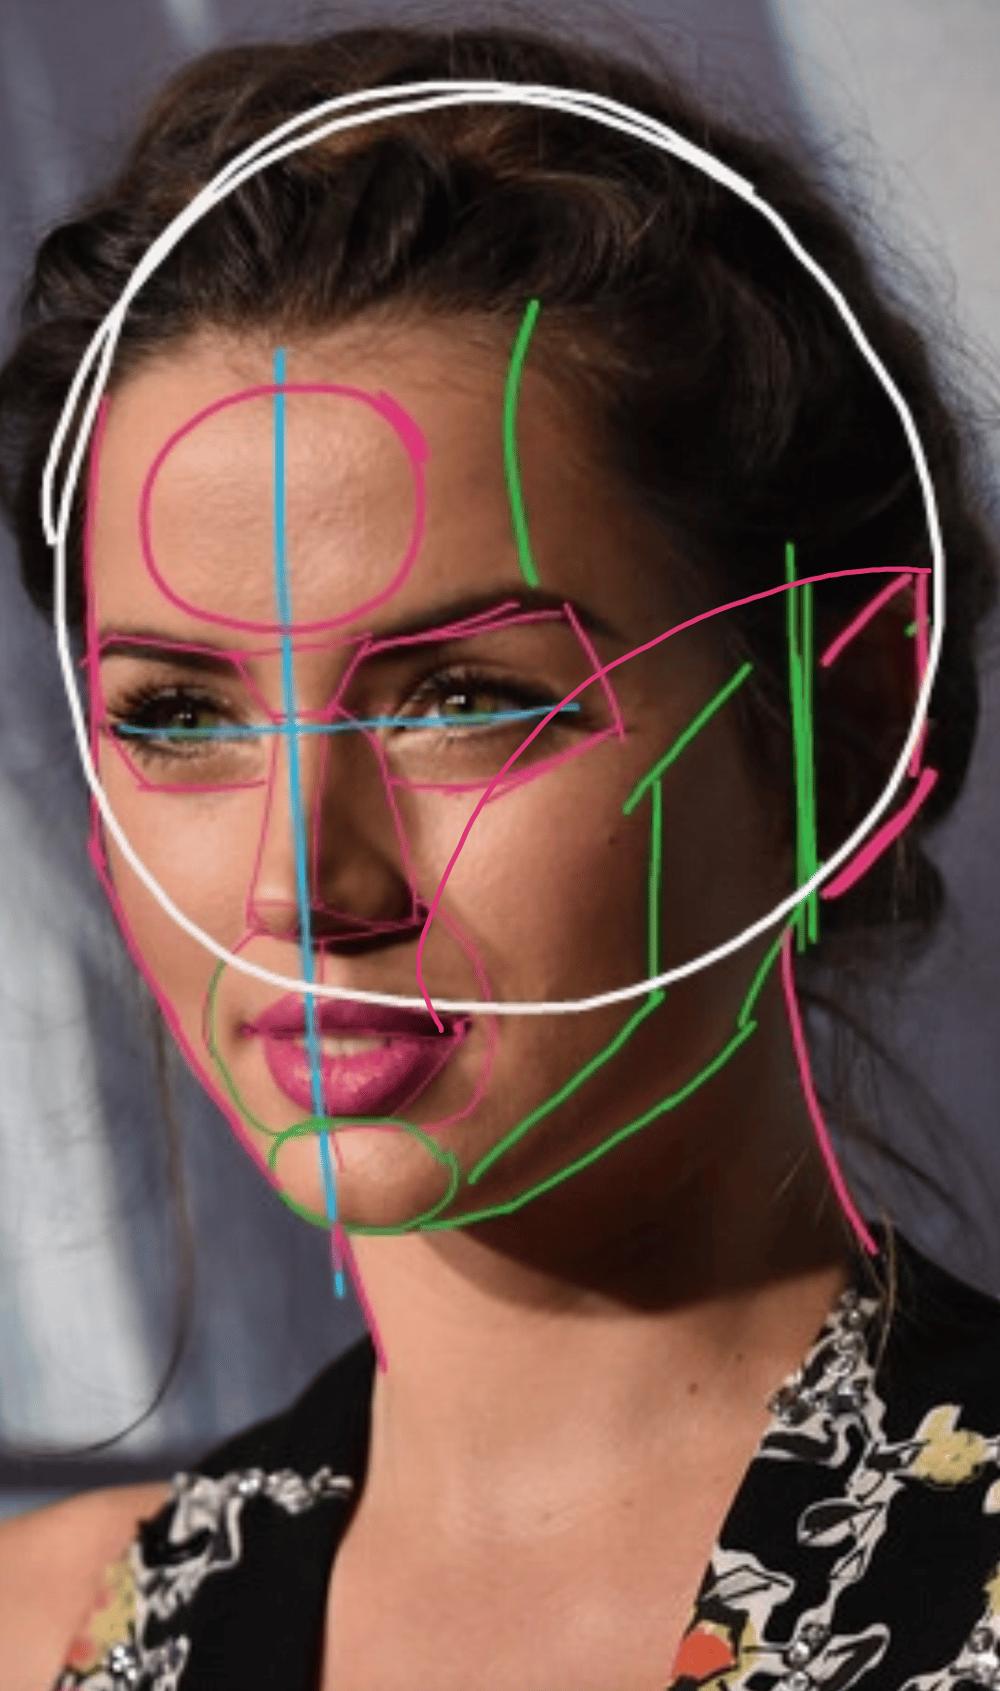 Portraits - image 3 - student project